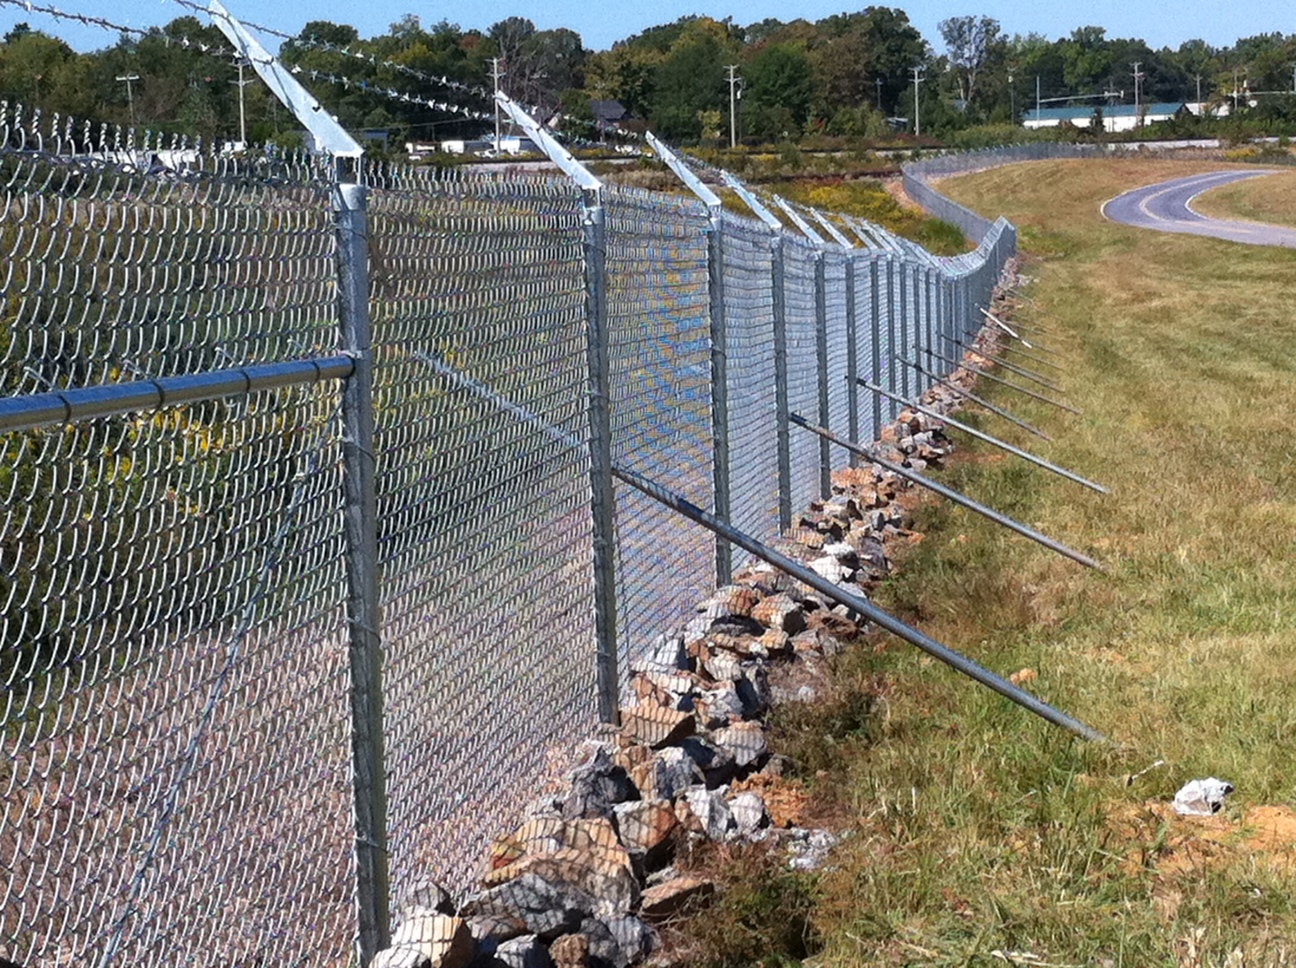 Apex fence company canton georgia proview